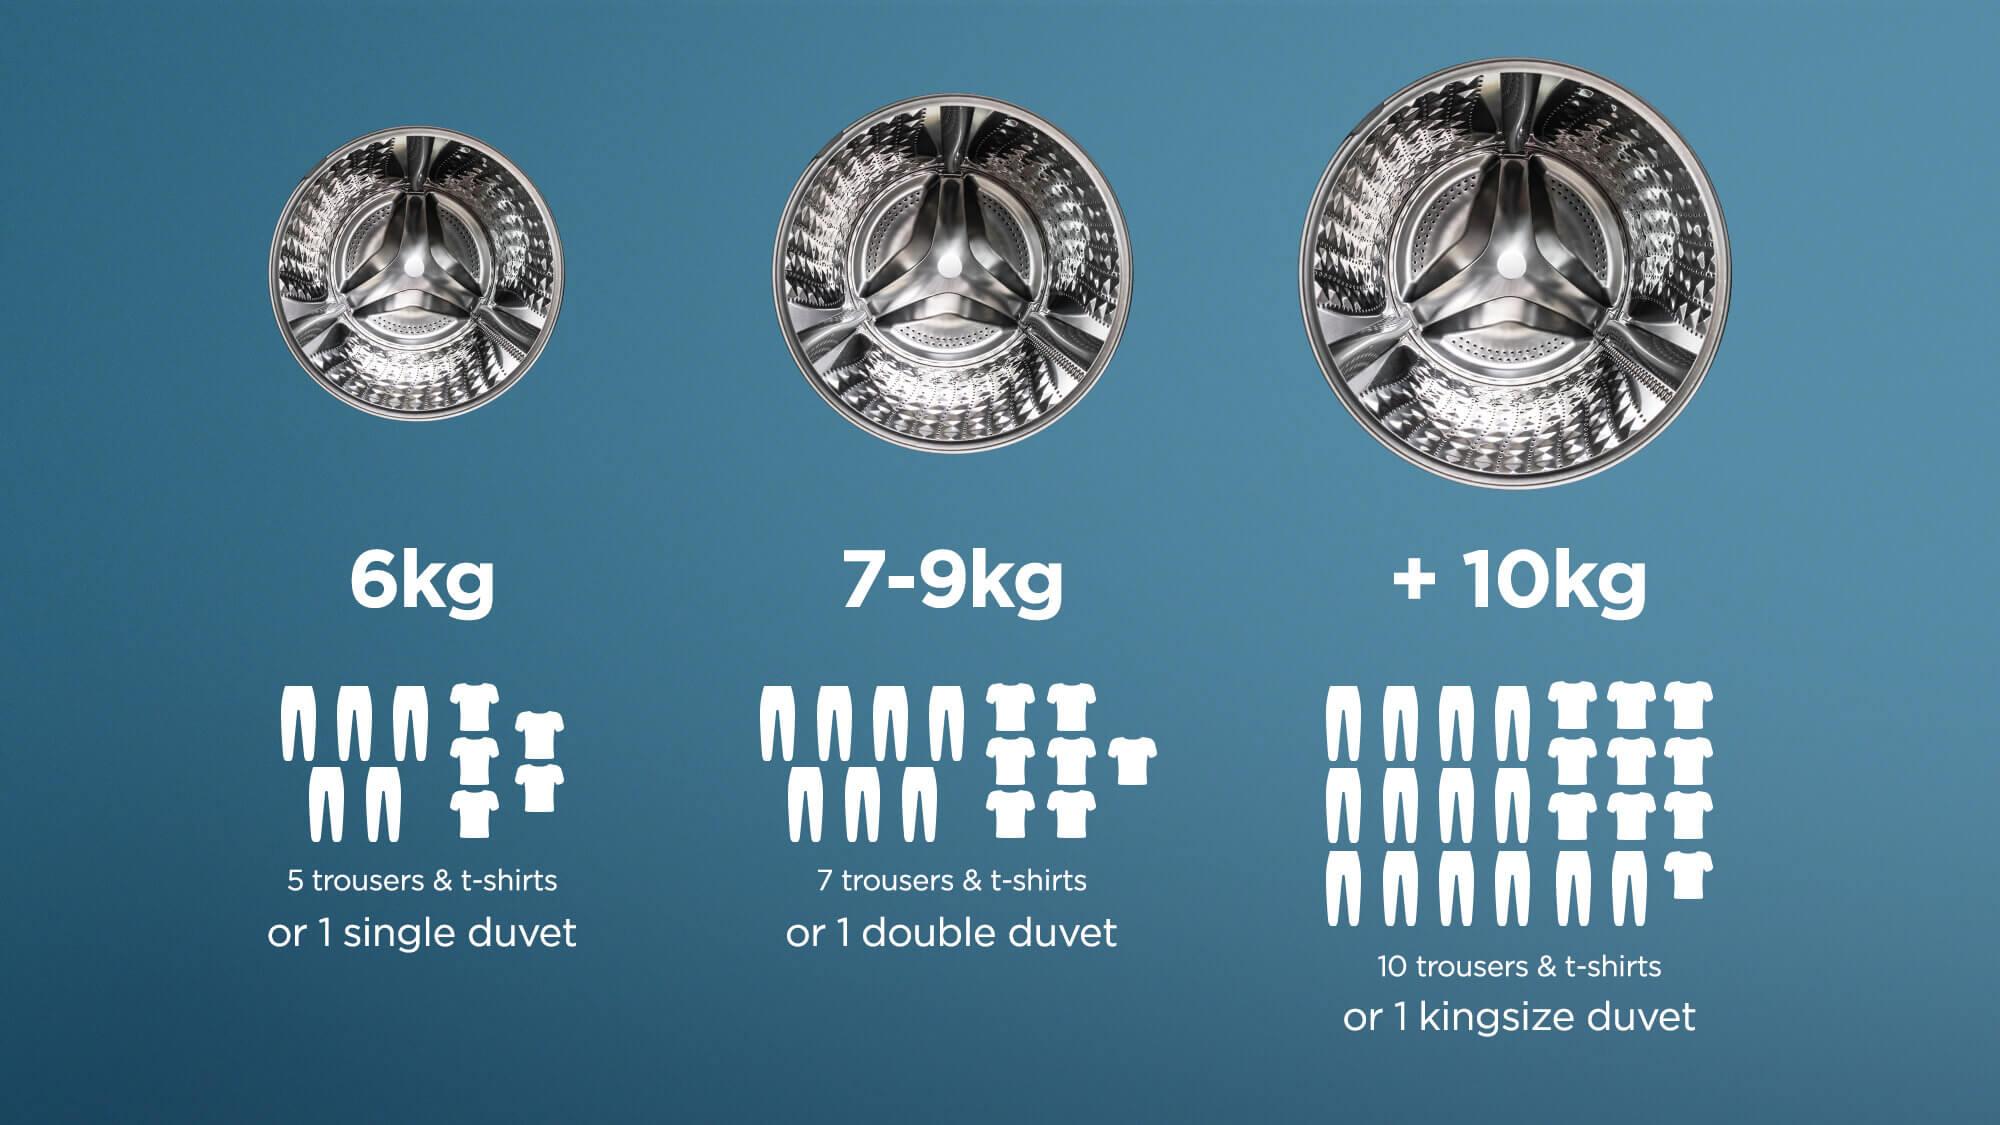 Drum Size Infographic